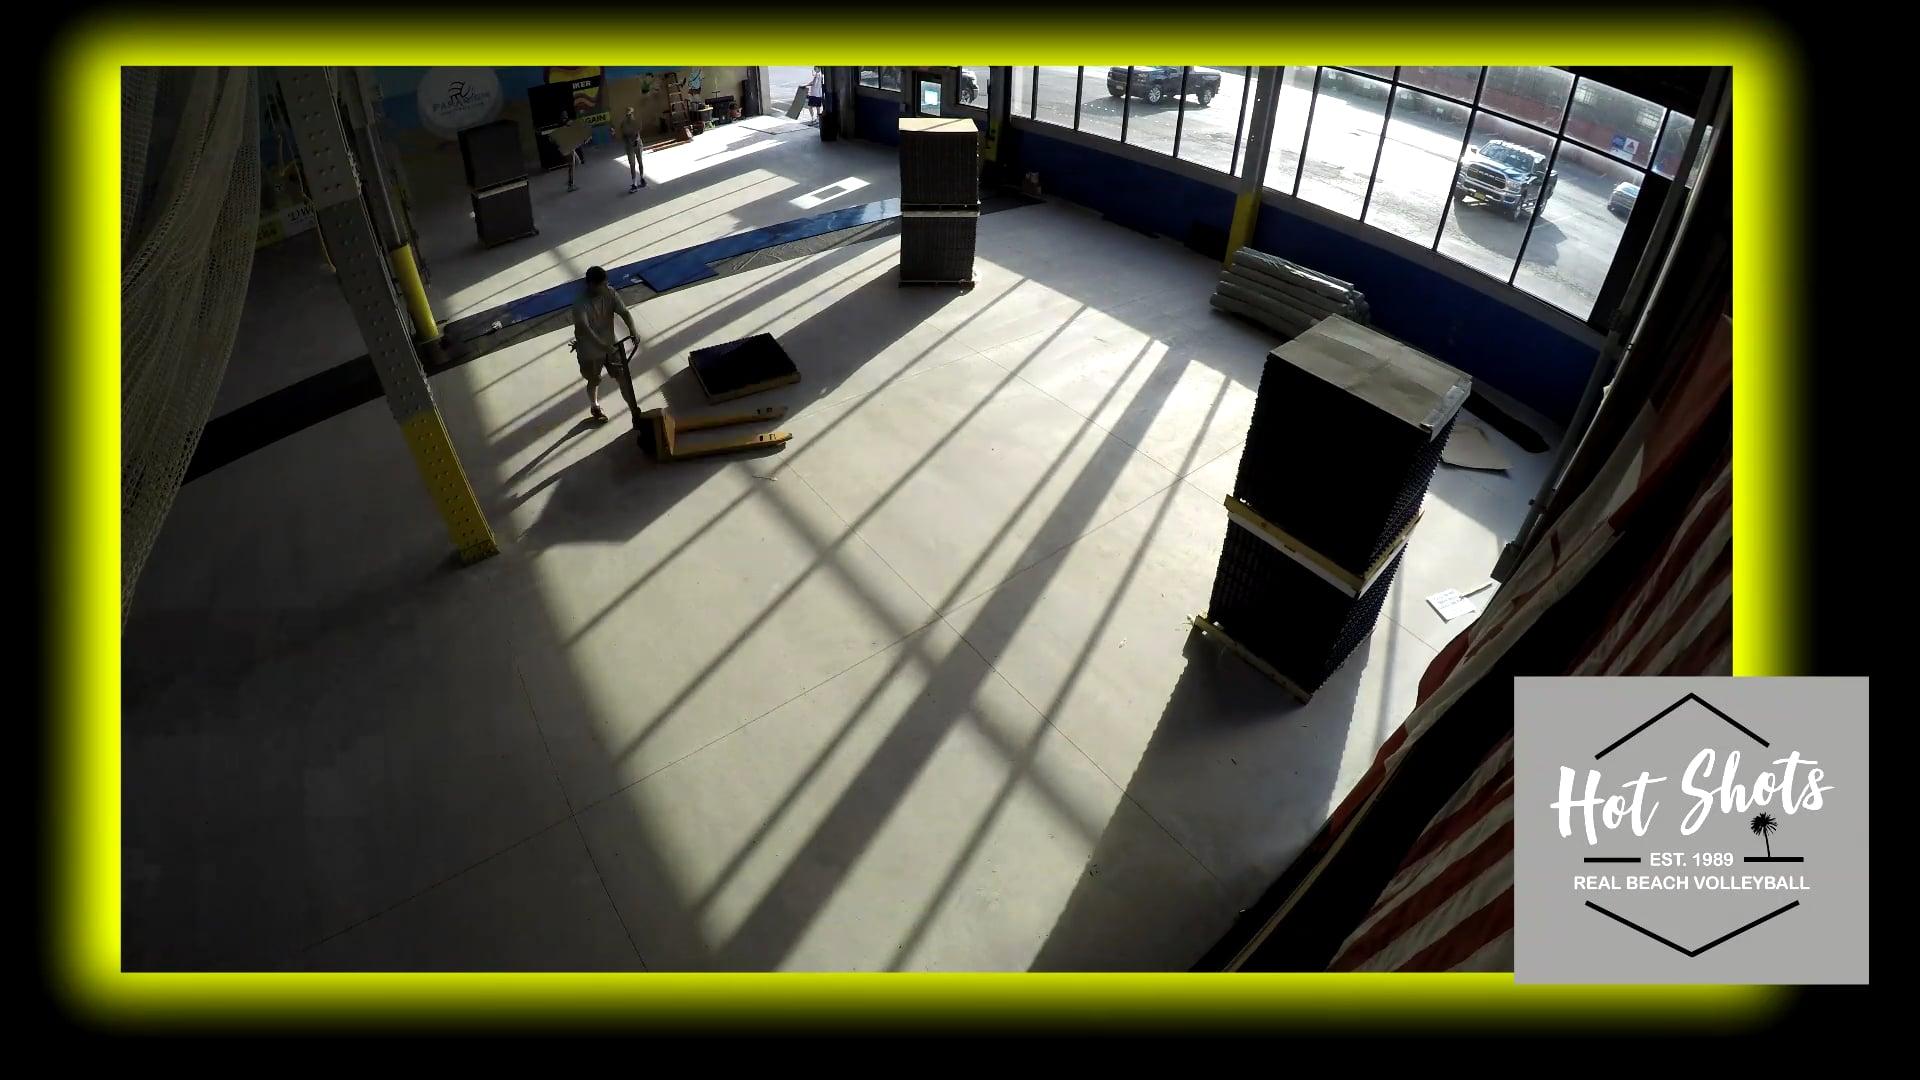 Hot Shots New Hardcourt Floor Install